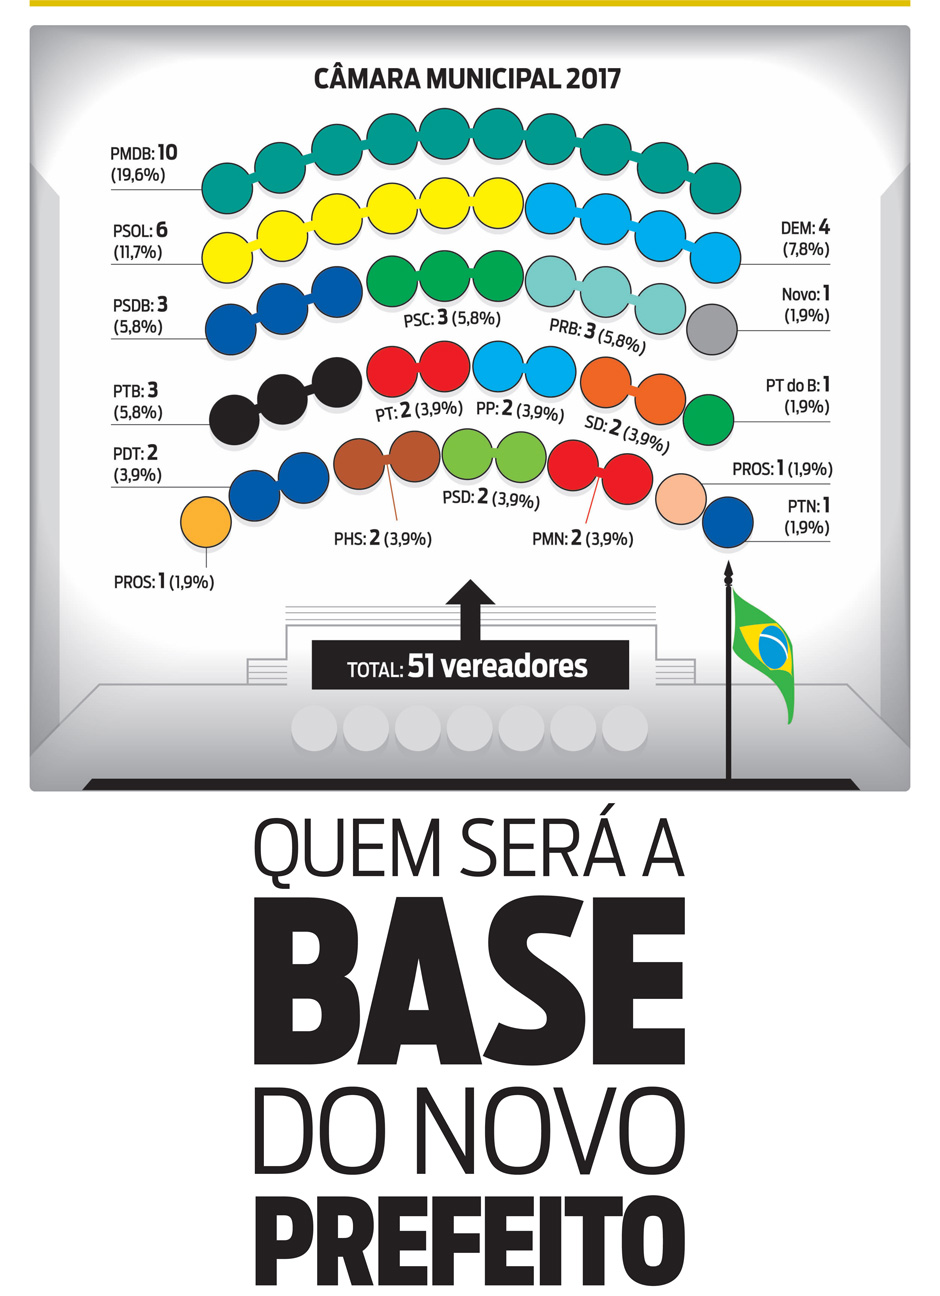 Câmara de Vereadores: Qual será a base do novo prefeito do Rio?